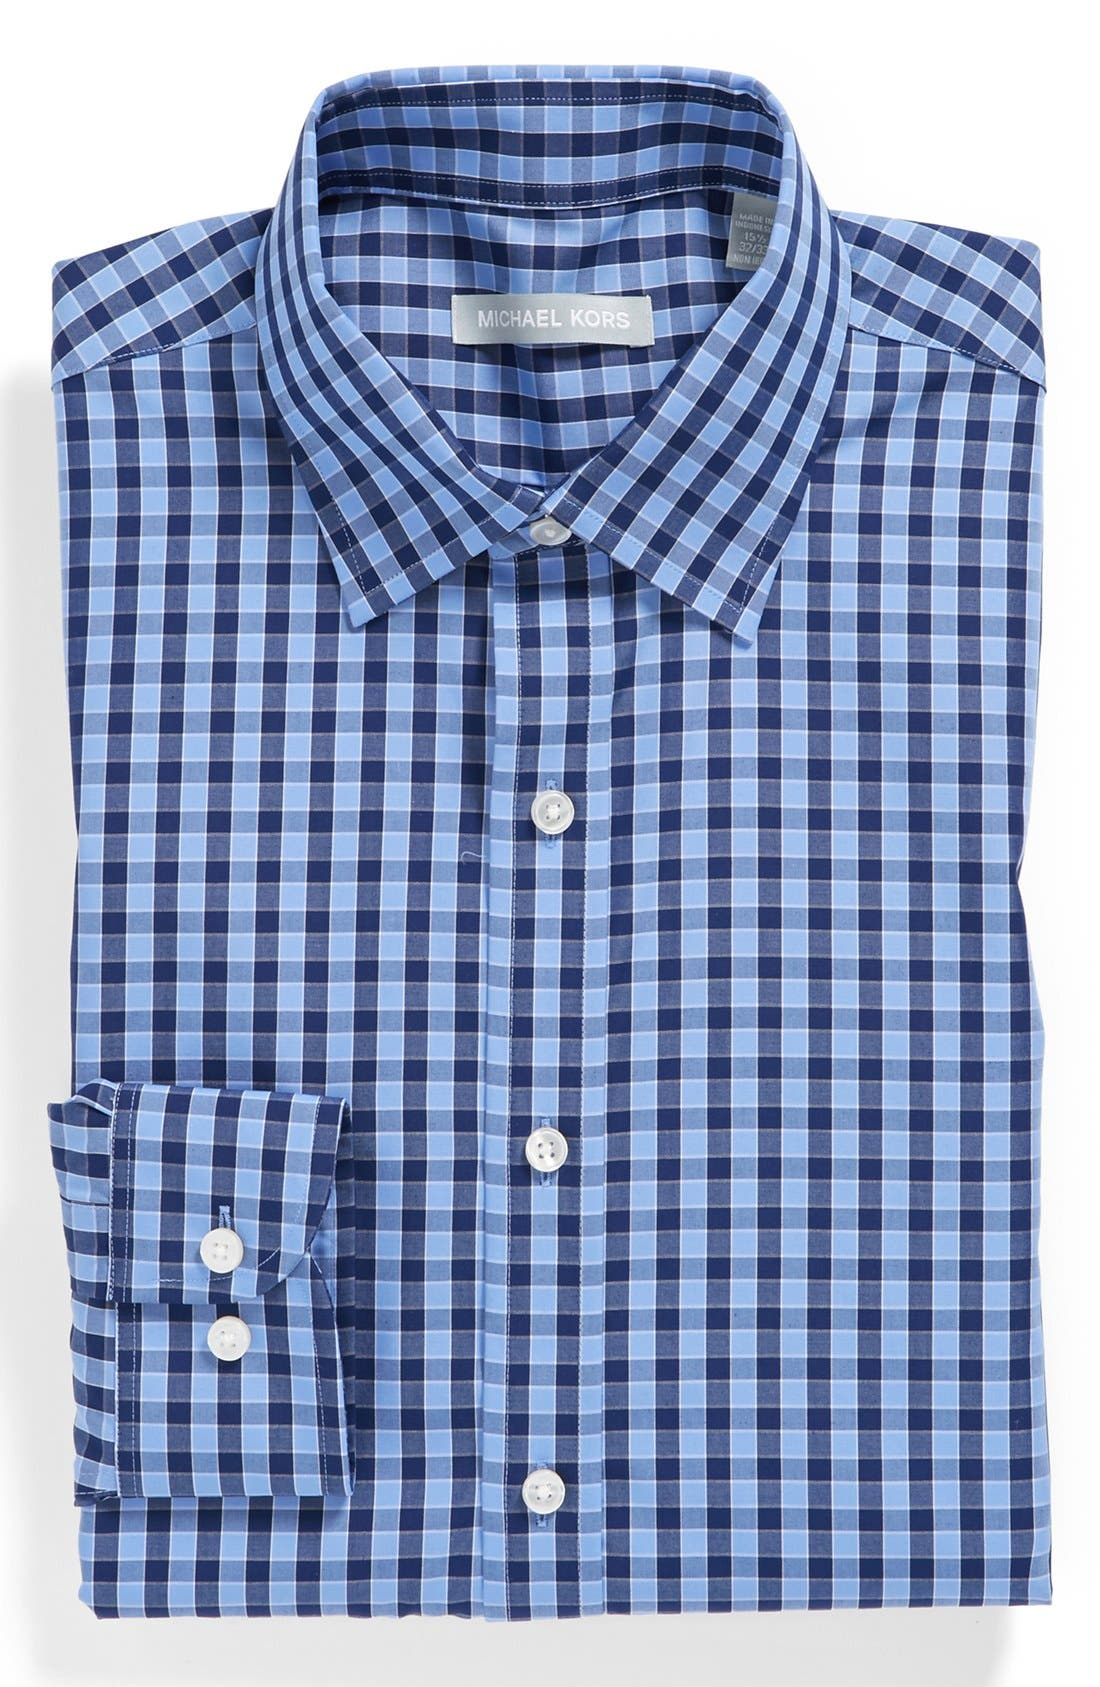 Main Image - Michael Kors Gingham Regular Fit Non-Iron Dress Shirt